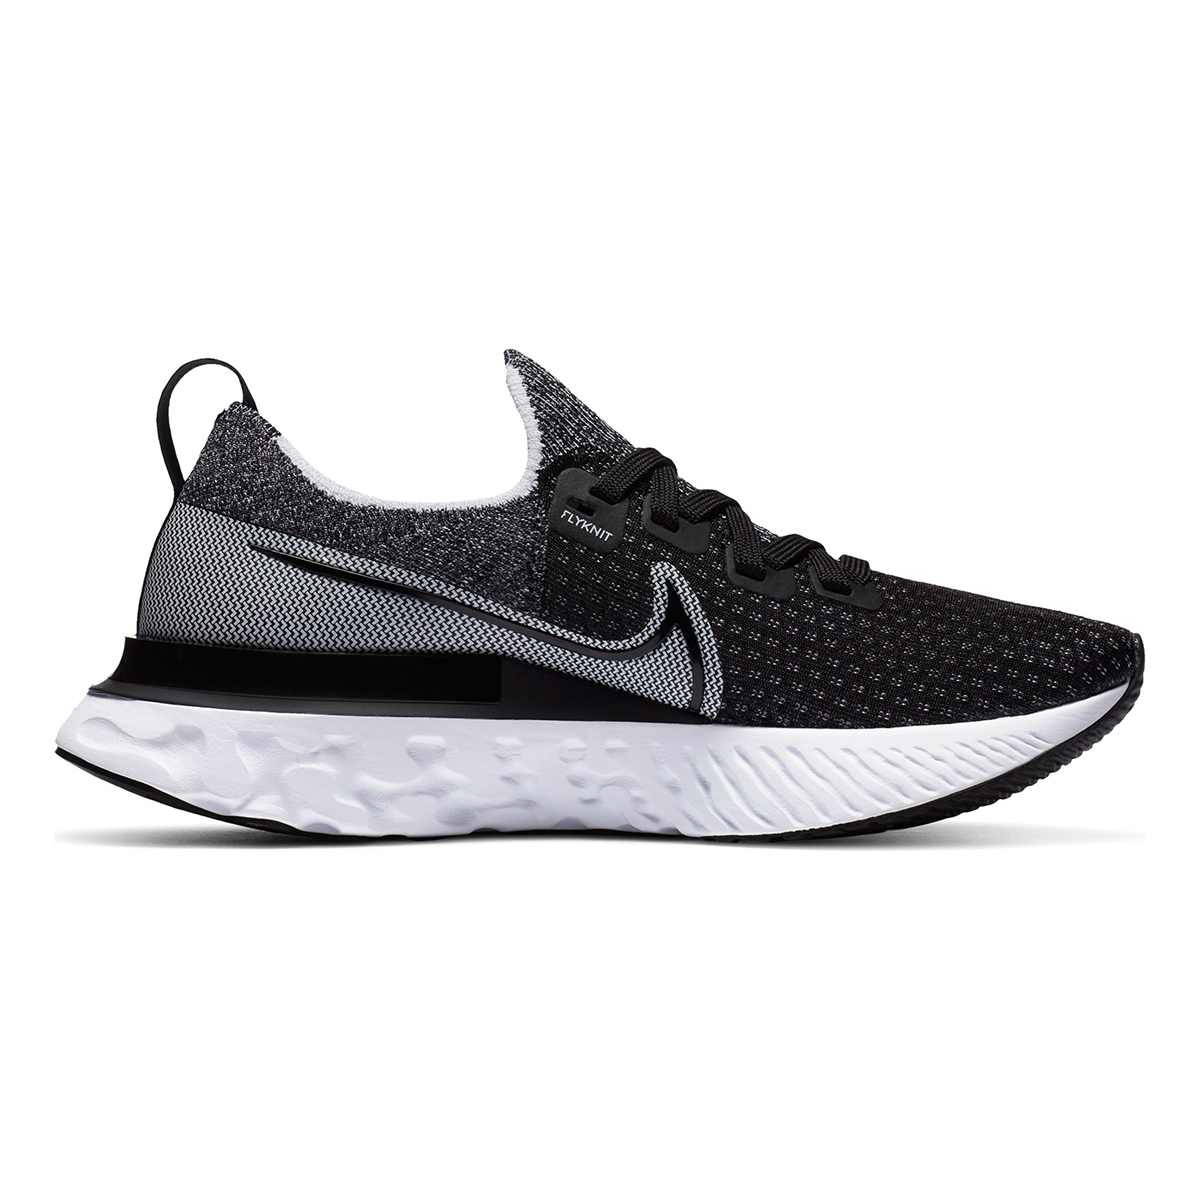 Women's Nike React Infinity Run Flyknit Running Shoe - Color: Black/White/White - Size: 5 - Width: Regular, Black/White/White, large, image 2